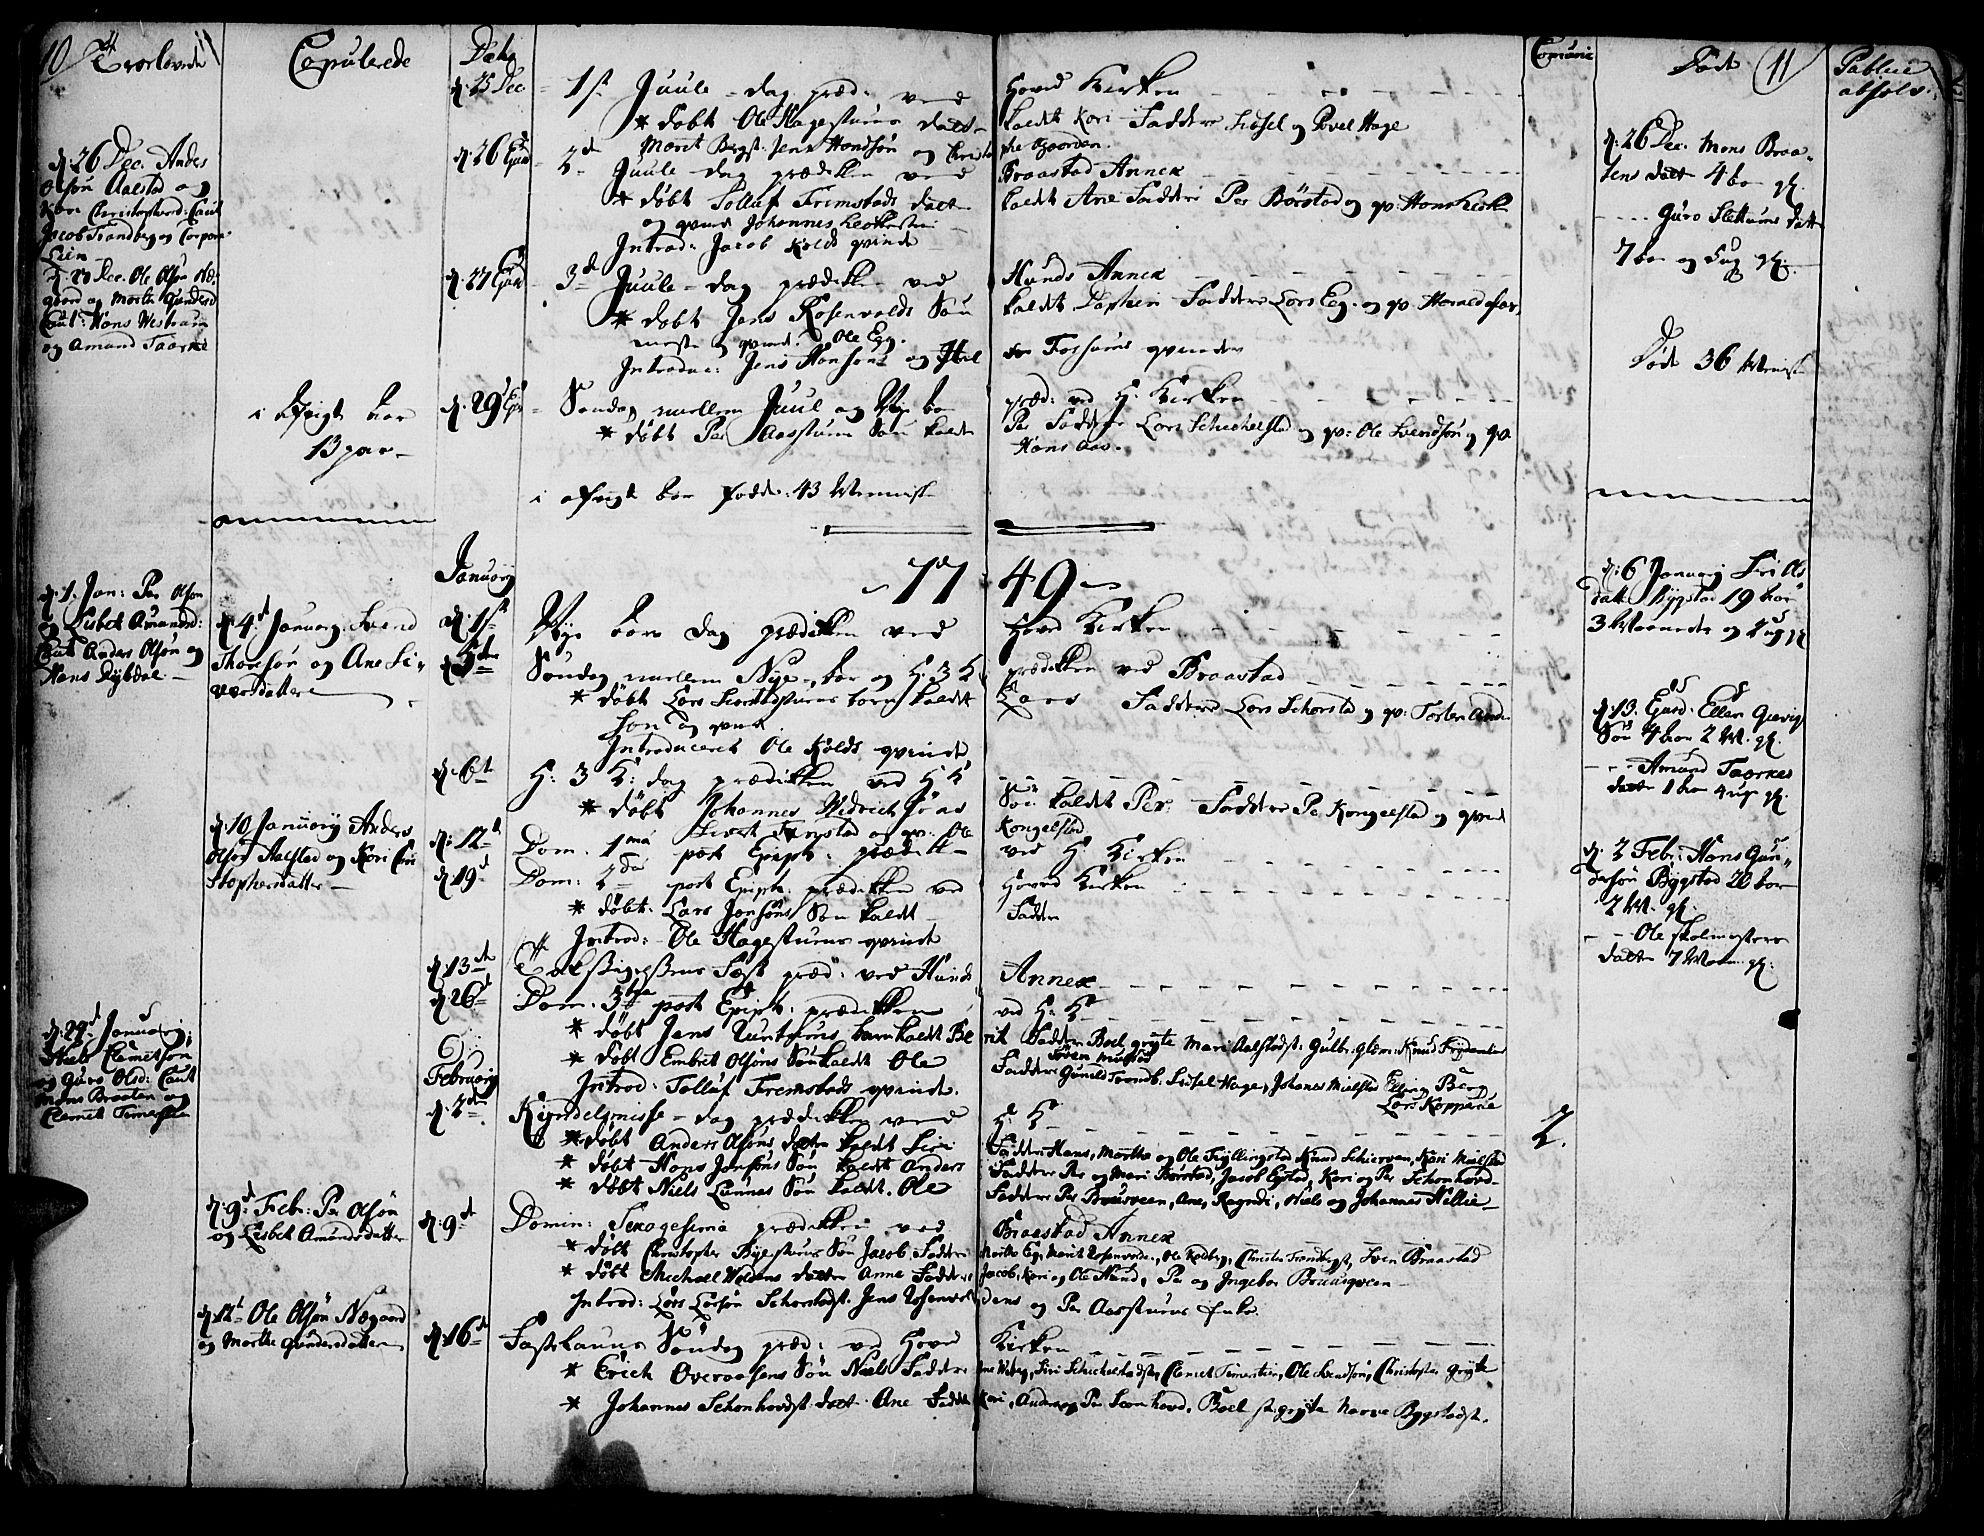 SAH, Vardal prestekontor, H/Ha/Haa/L0002: Ministerialbok nr. 2, 1748-1776, s. 10-11